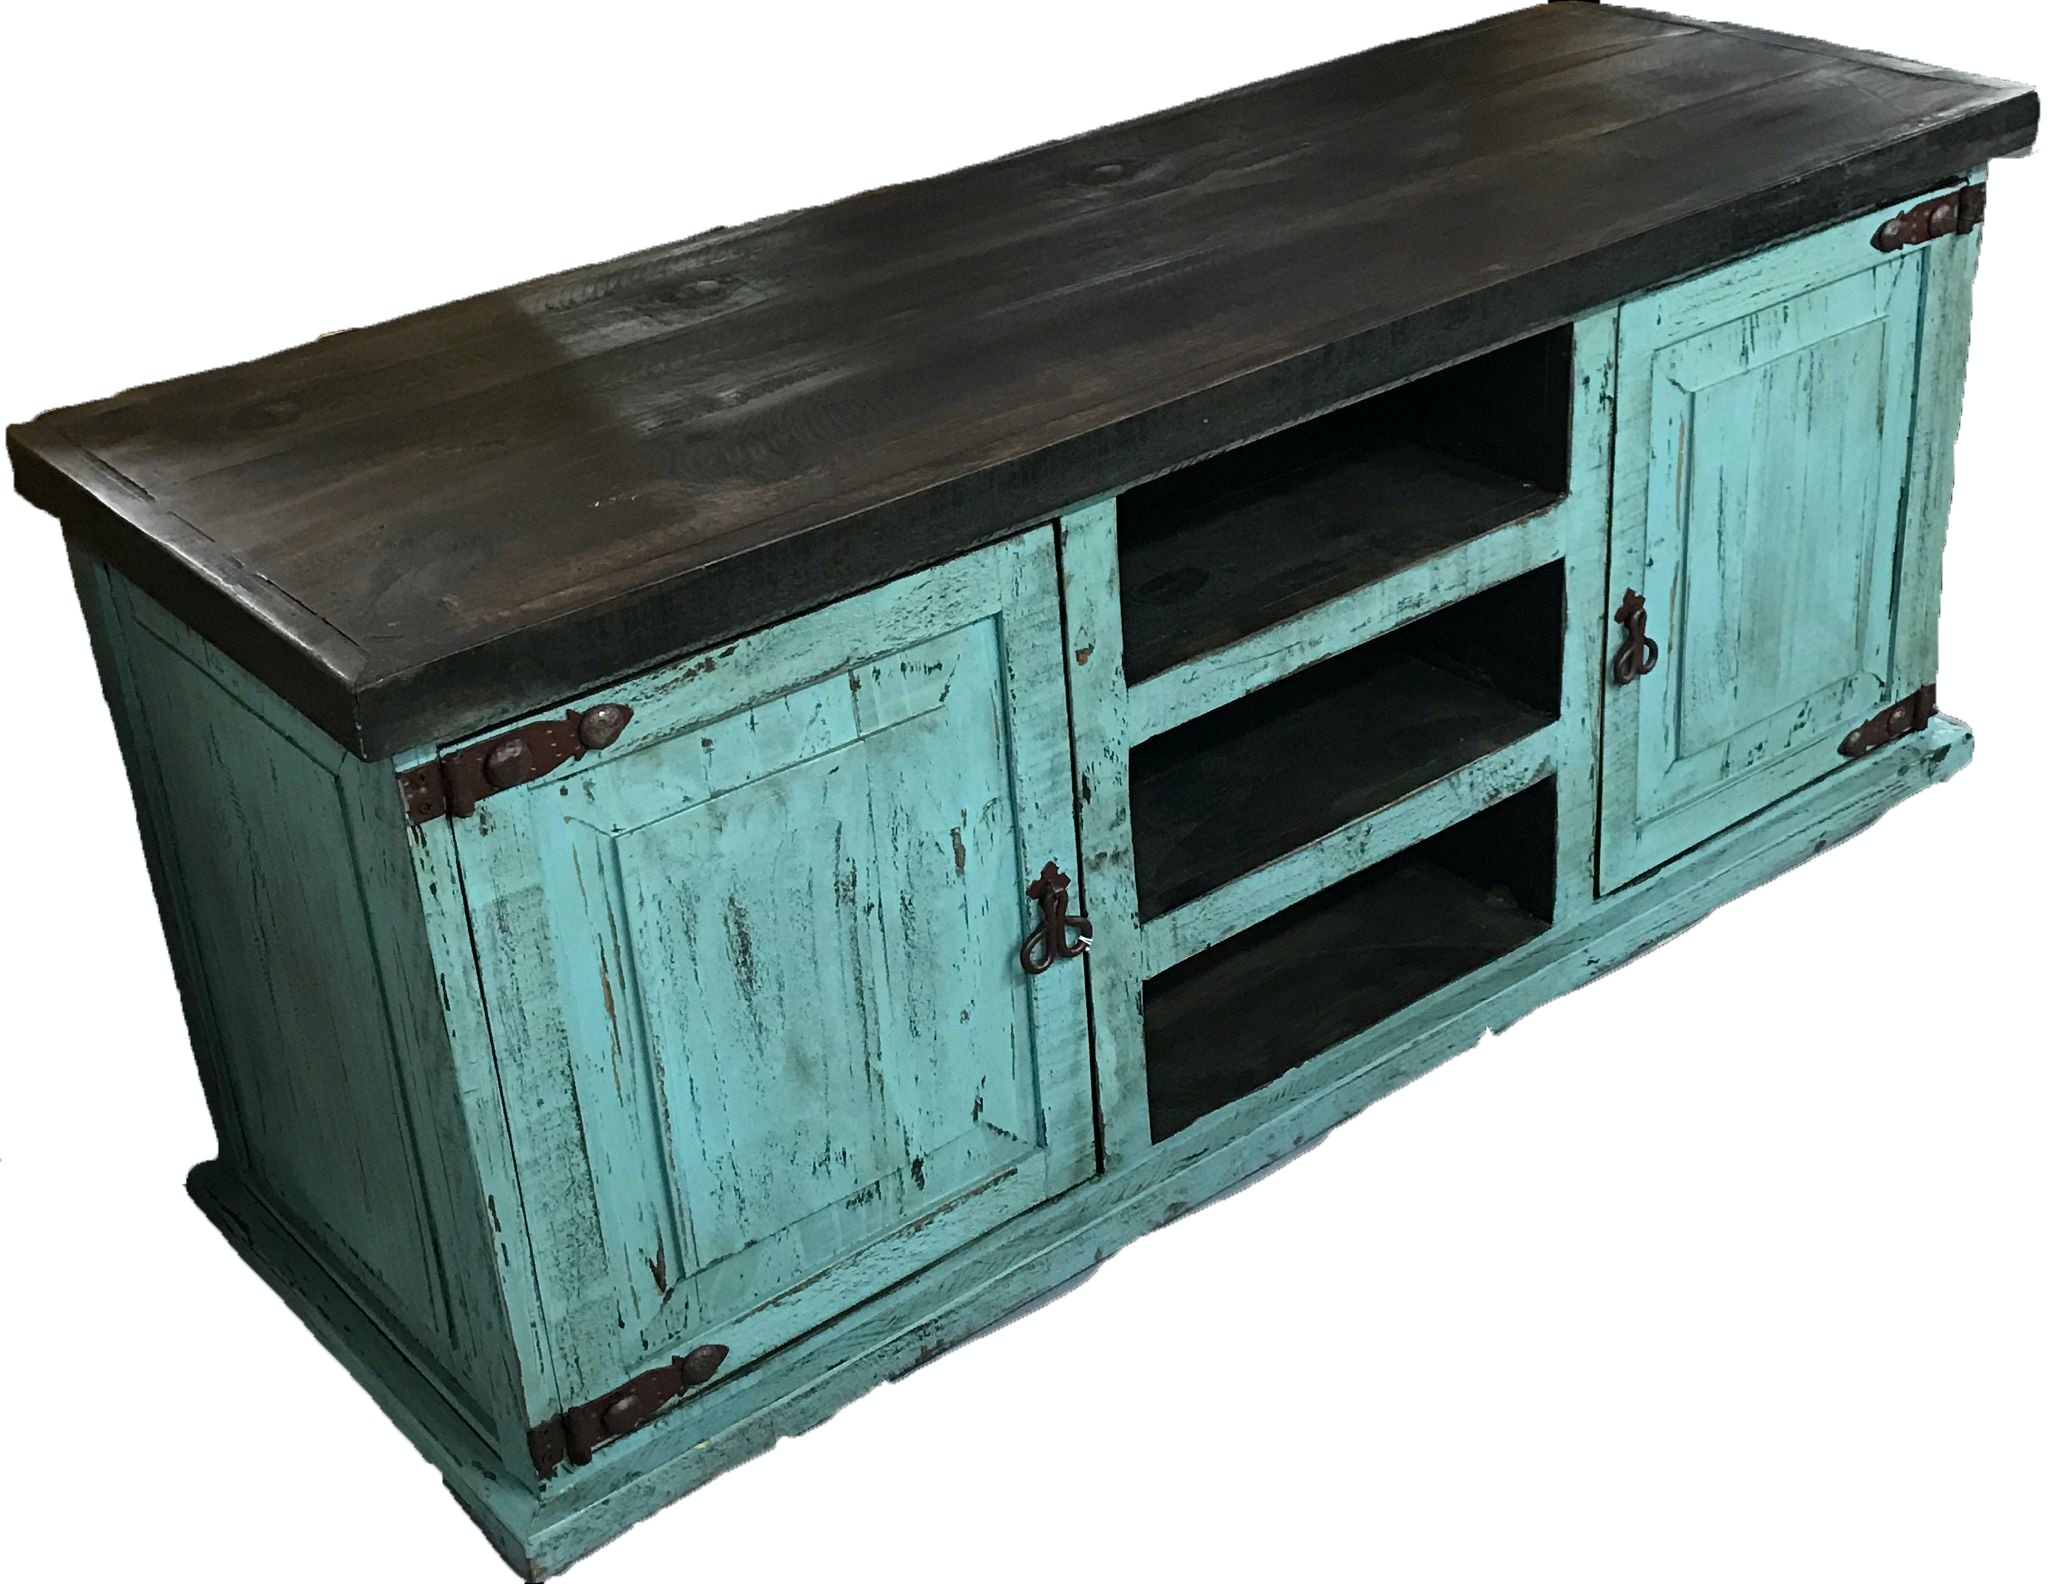 Rustic Canyon TV Stand YTV55AQ At Abernathyu0027s Furniture